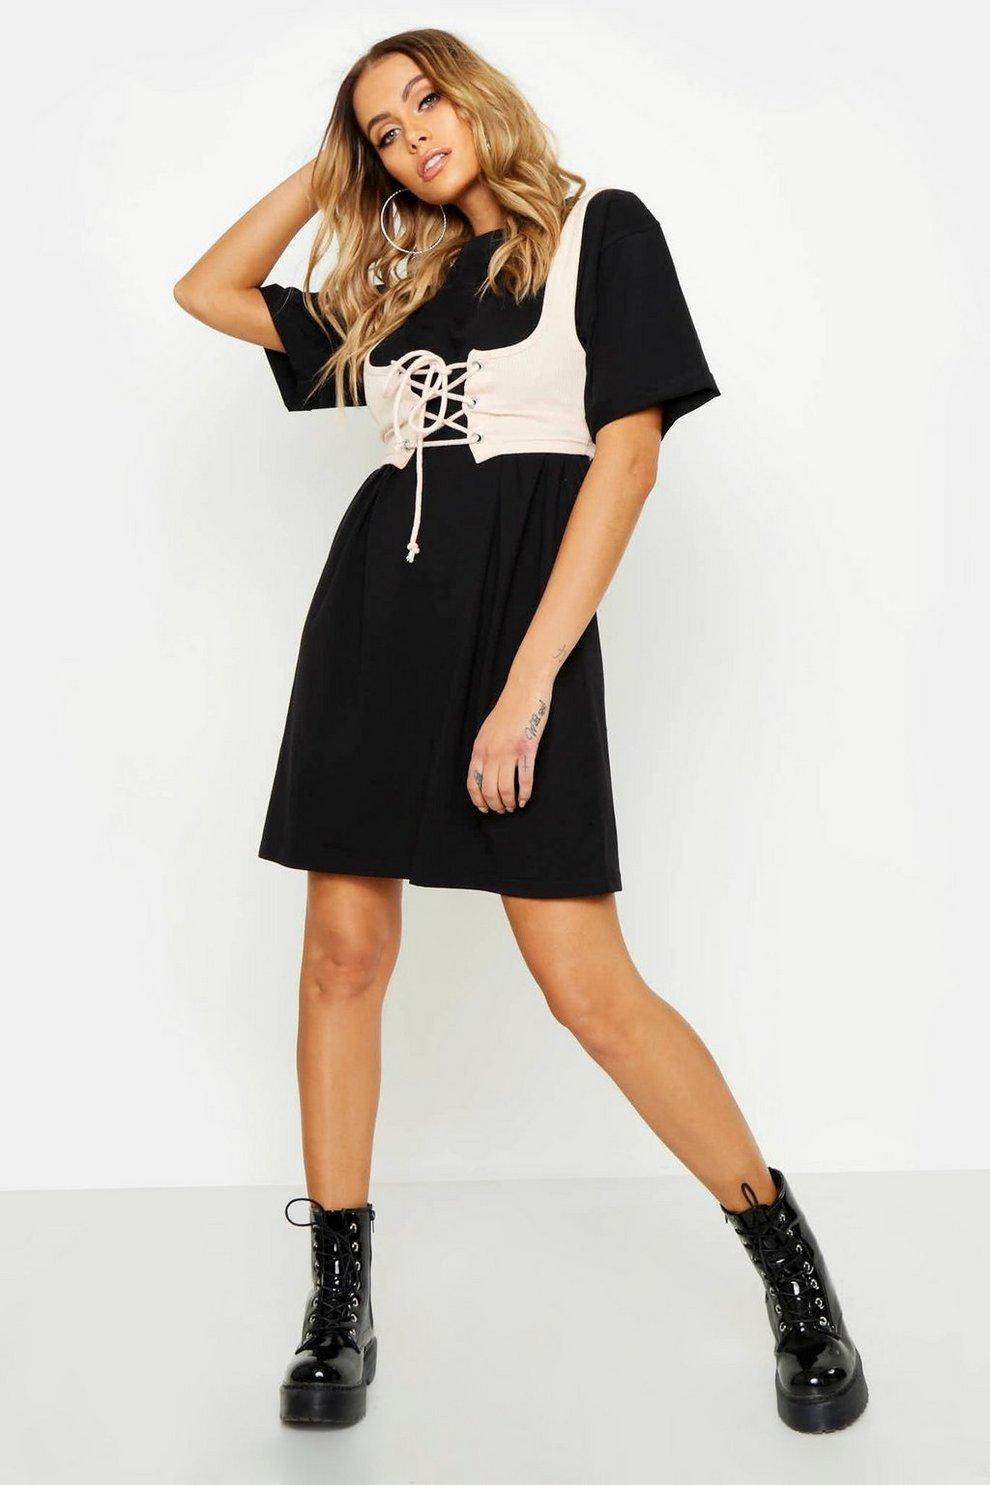 81e68b4f673 Womens Black Corset Detail Oversized Cotton T Shirt Dress